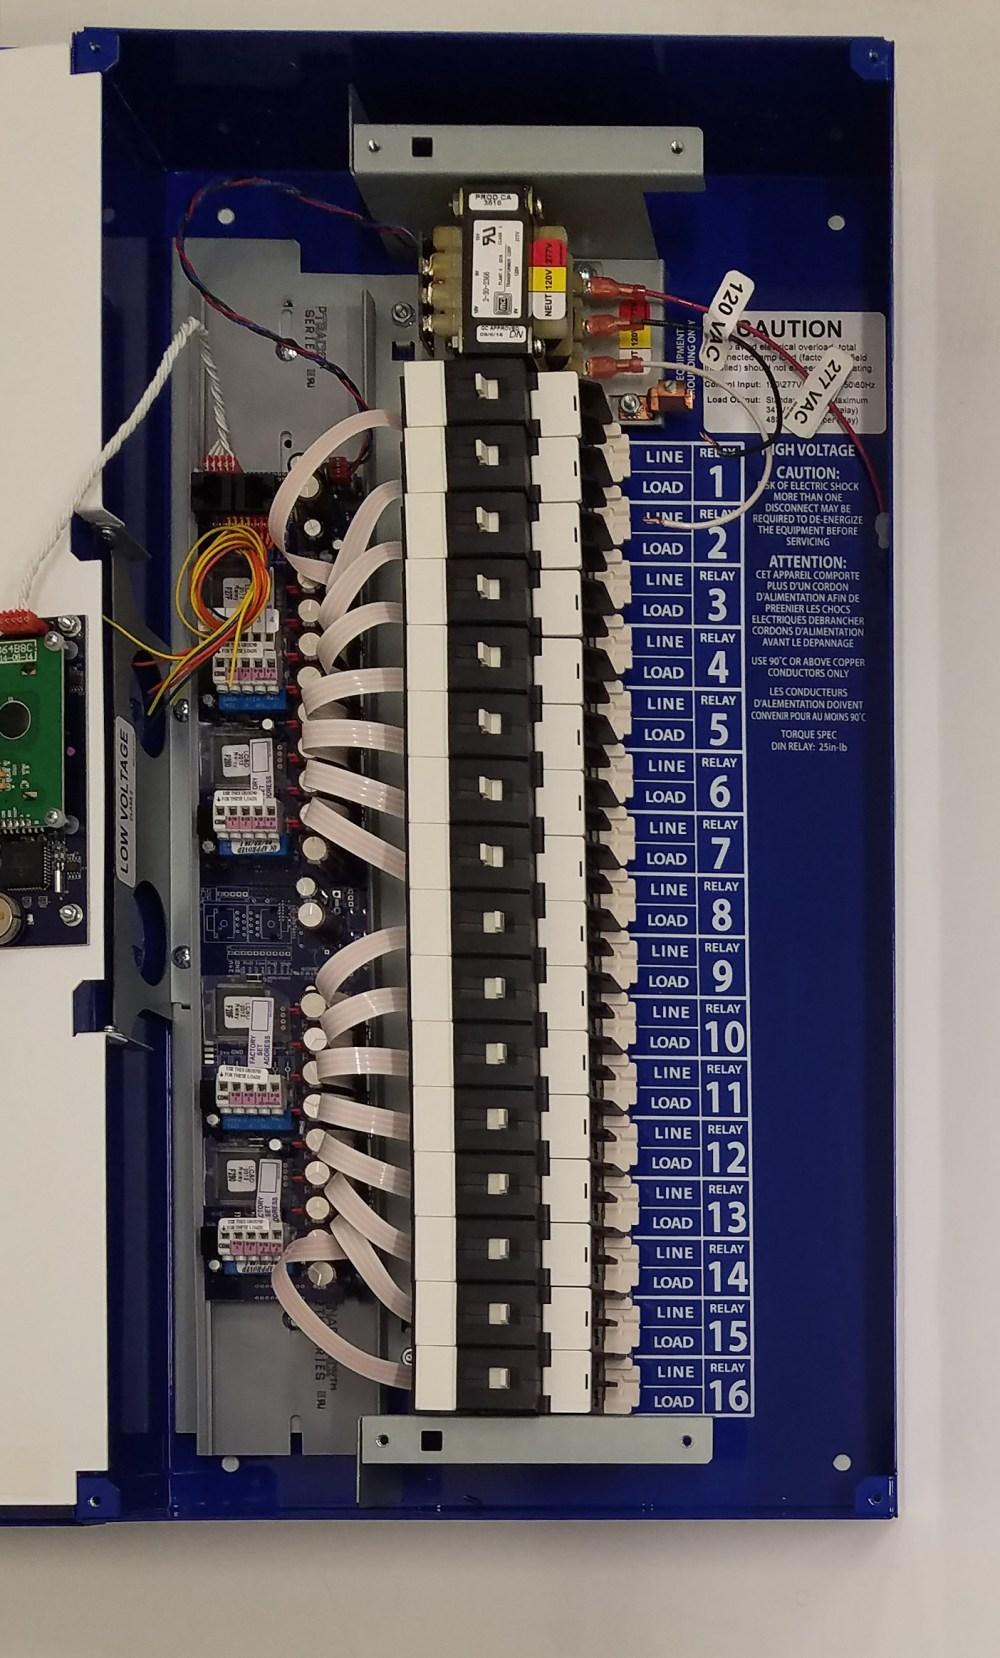 medium resolution of gr1416 ltd lc d 16 relay dimming blue box lighting control panel literite controls